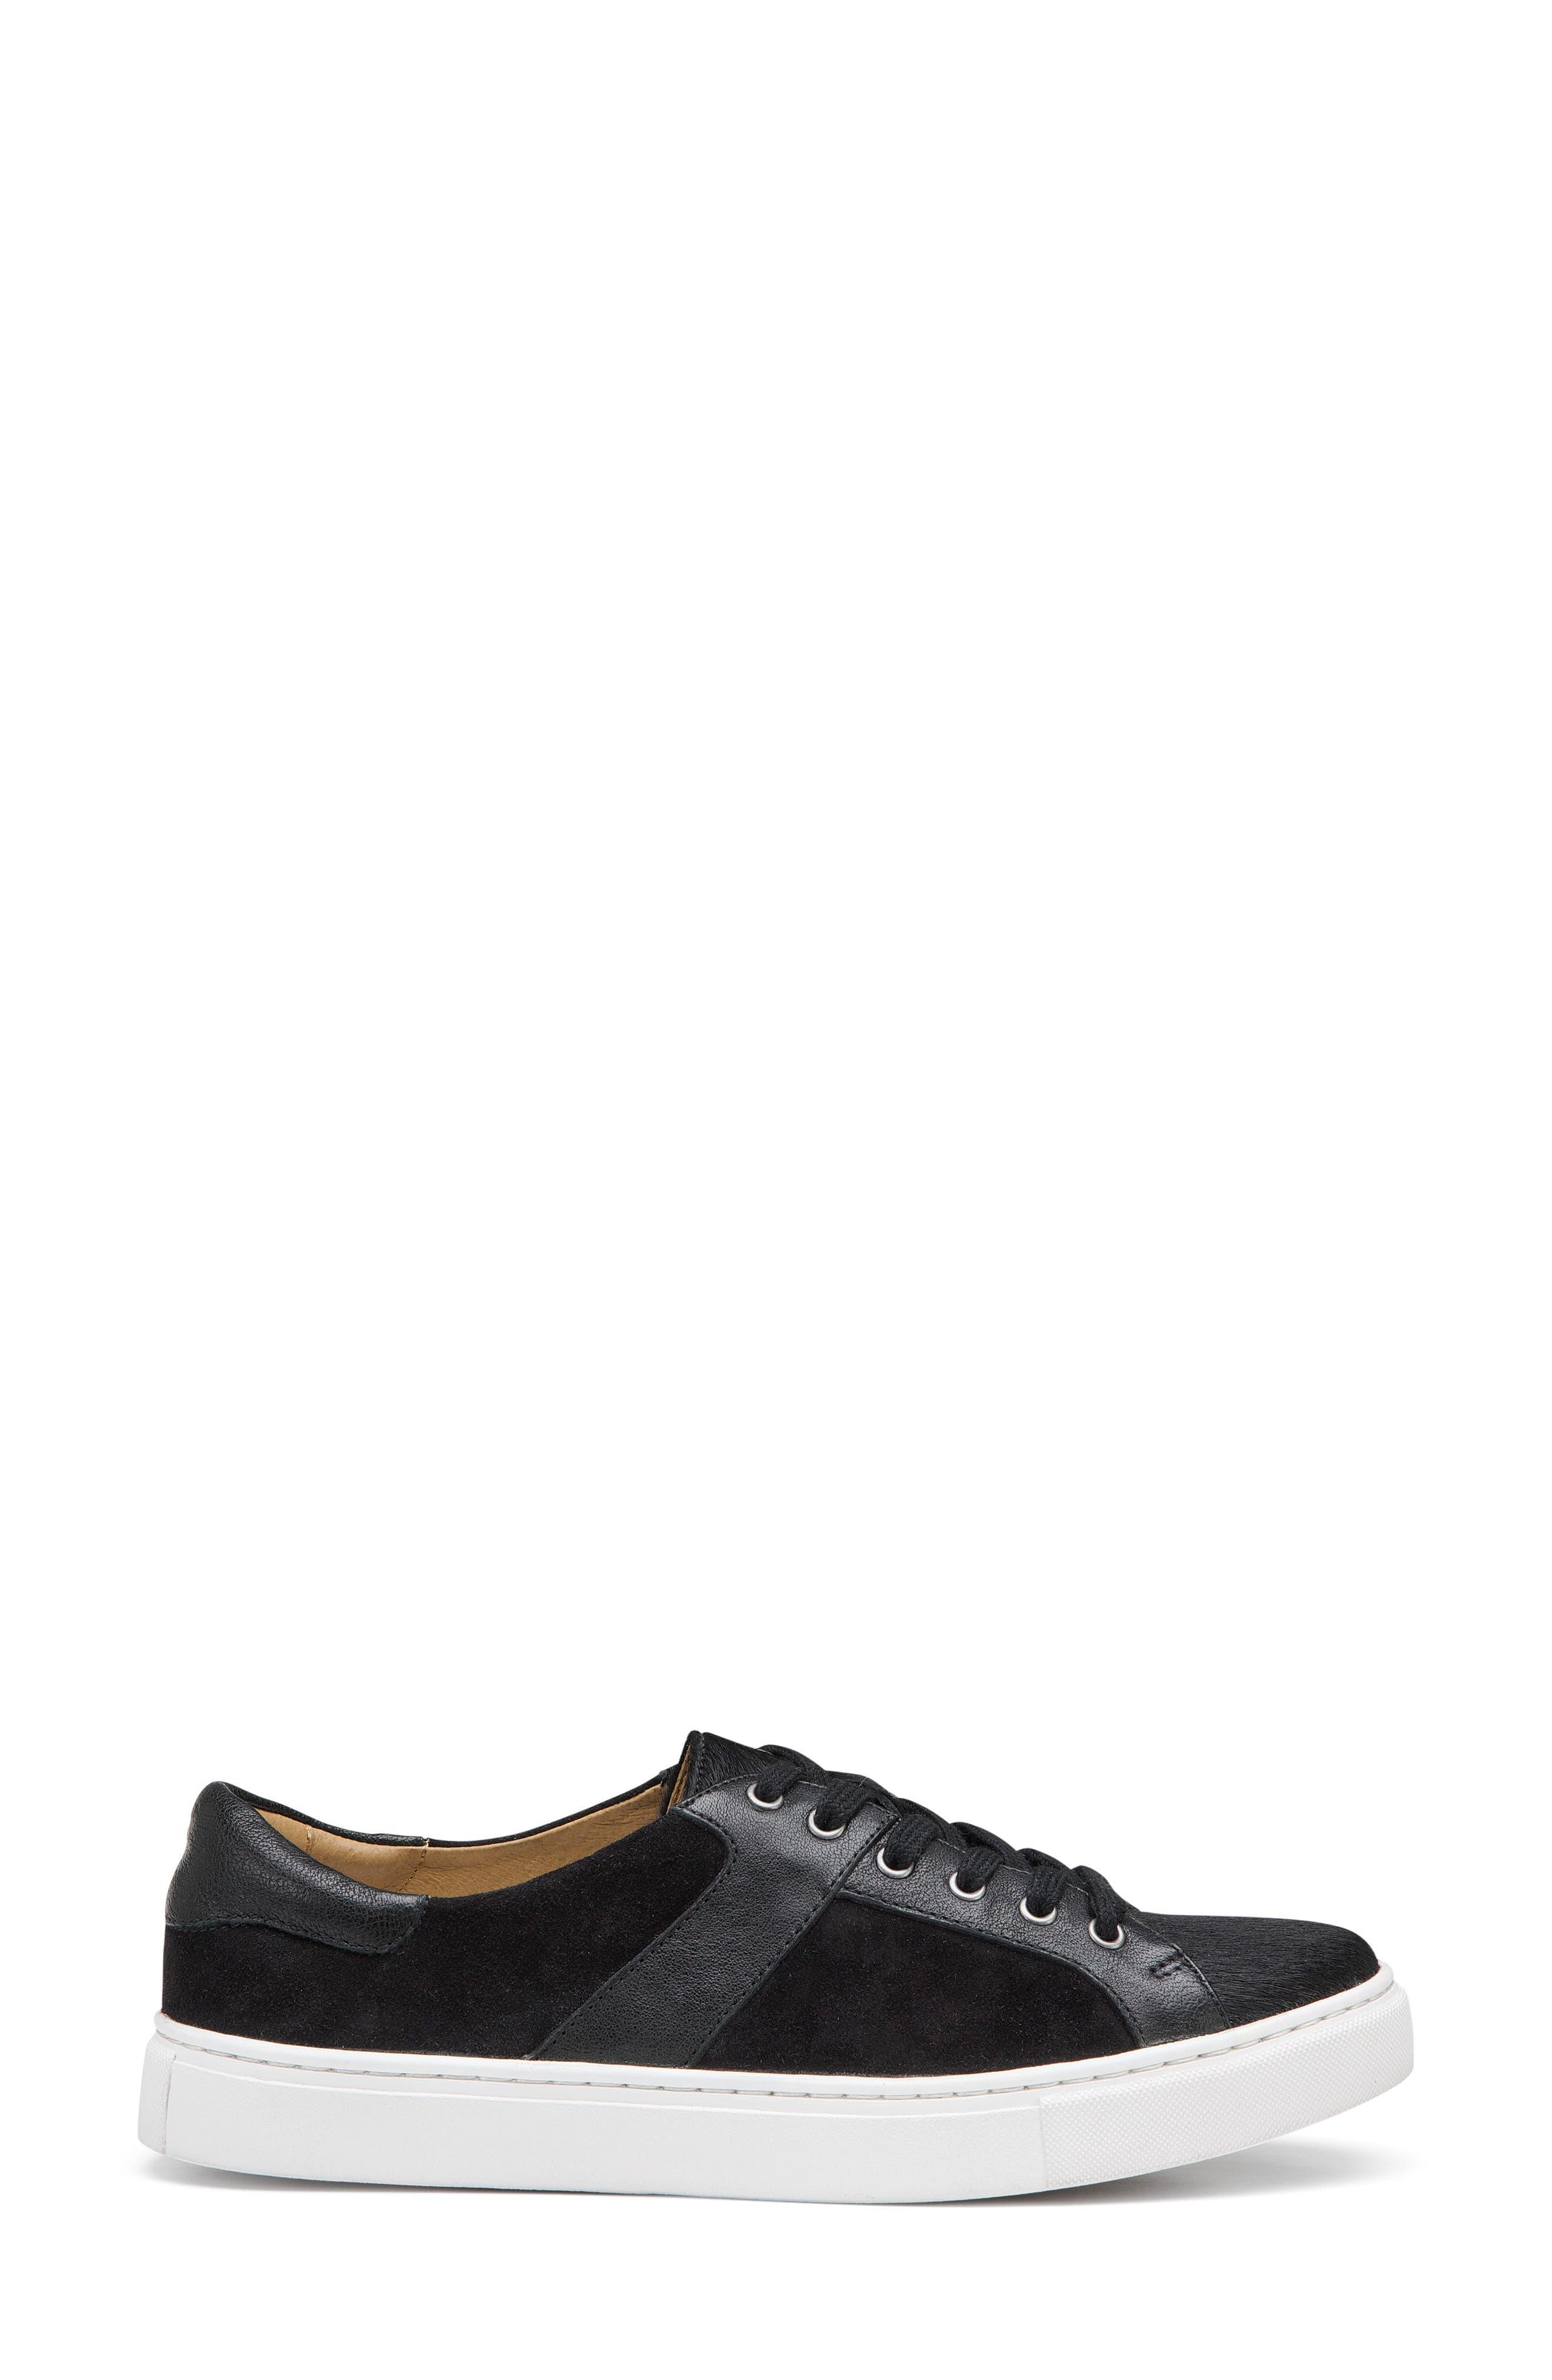 Lindsey Genuine Calf Hair Sneaker,                             Alternate thumbnail 3, color,                             Black Calfhair